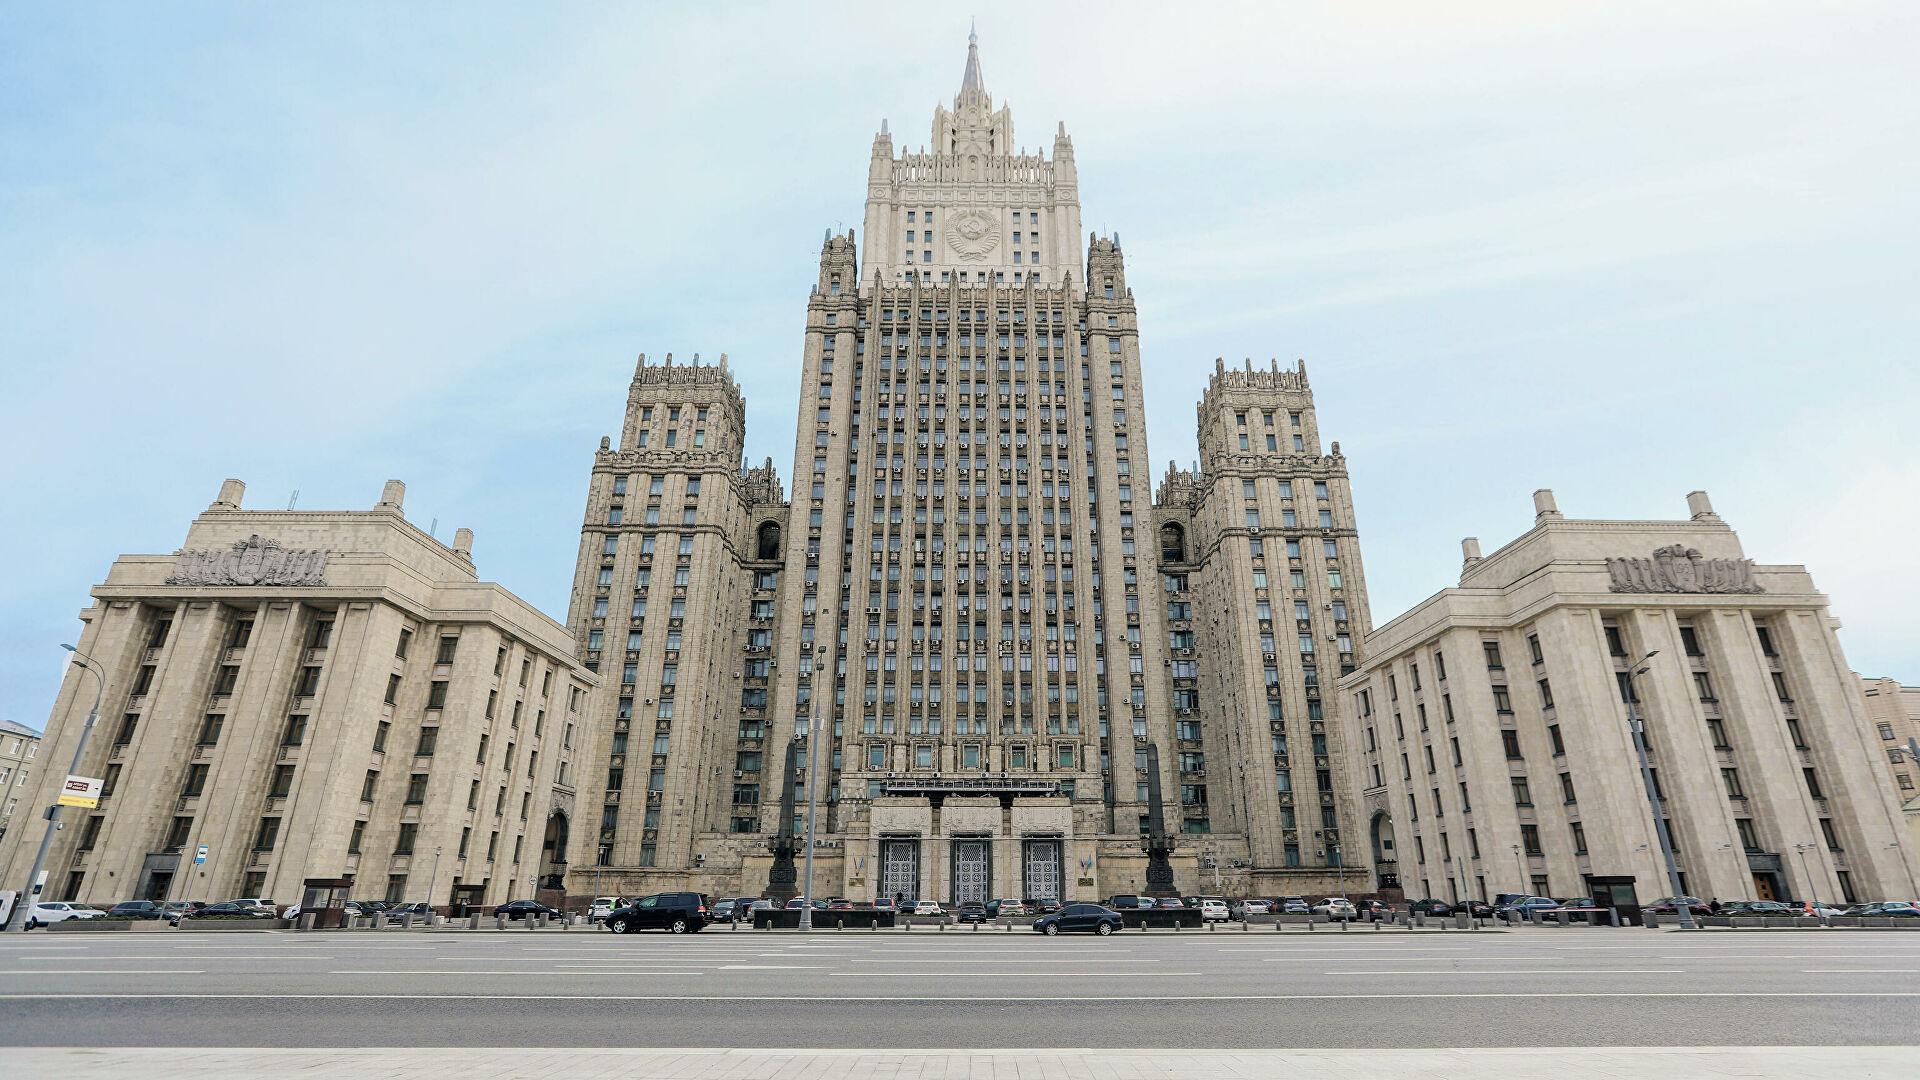 Rjabkov: Moskva upozorila Vašington na posledice provokativne politike Kijeva na istoku Ukrajine